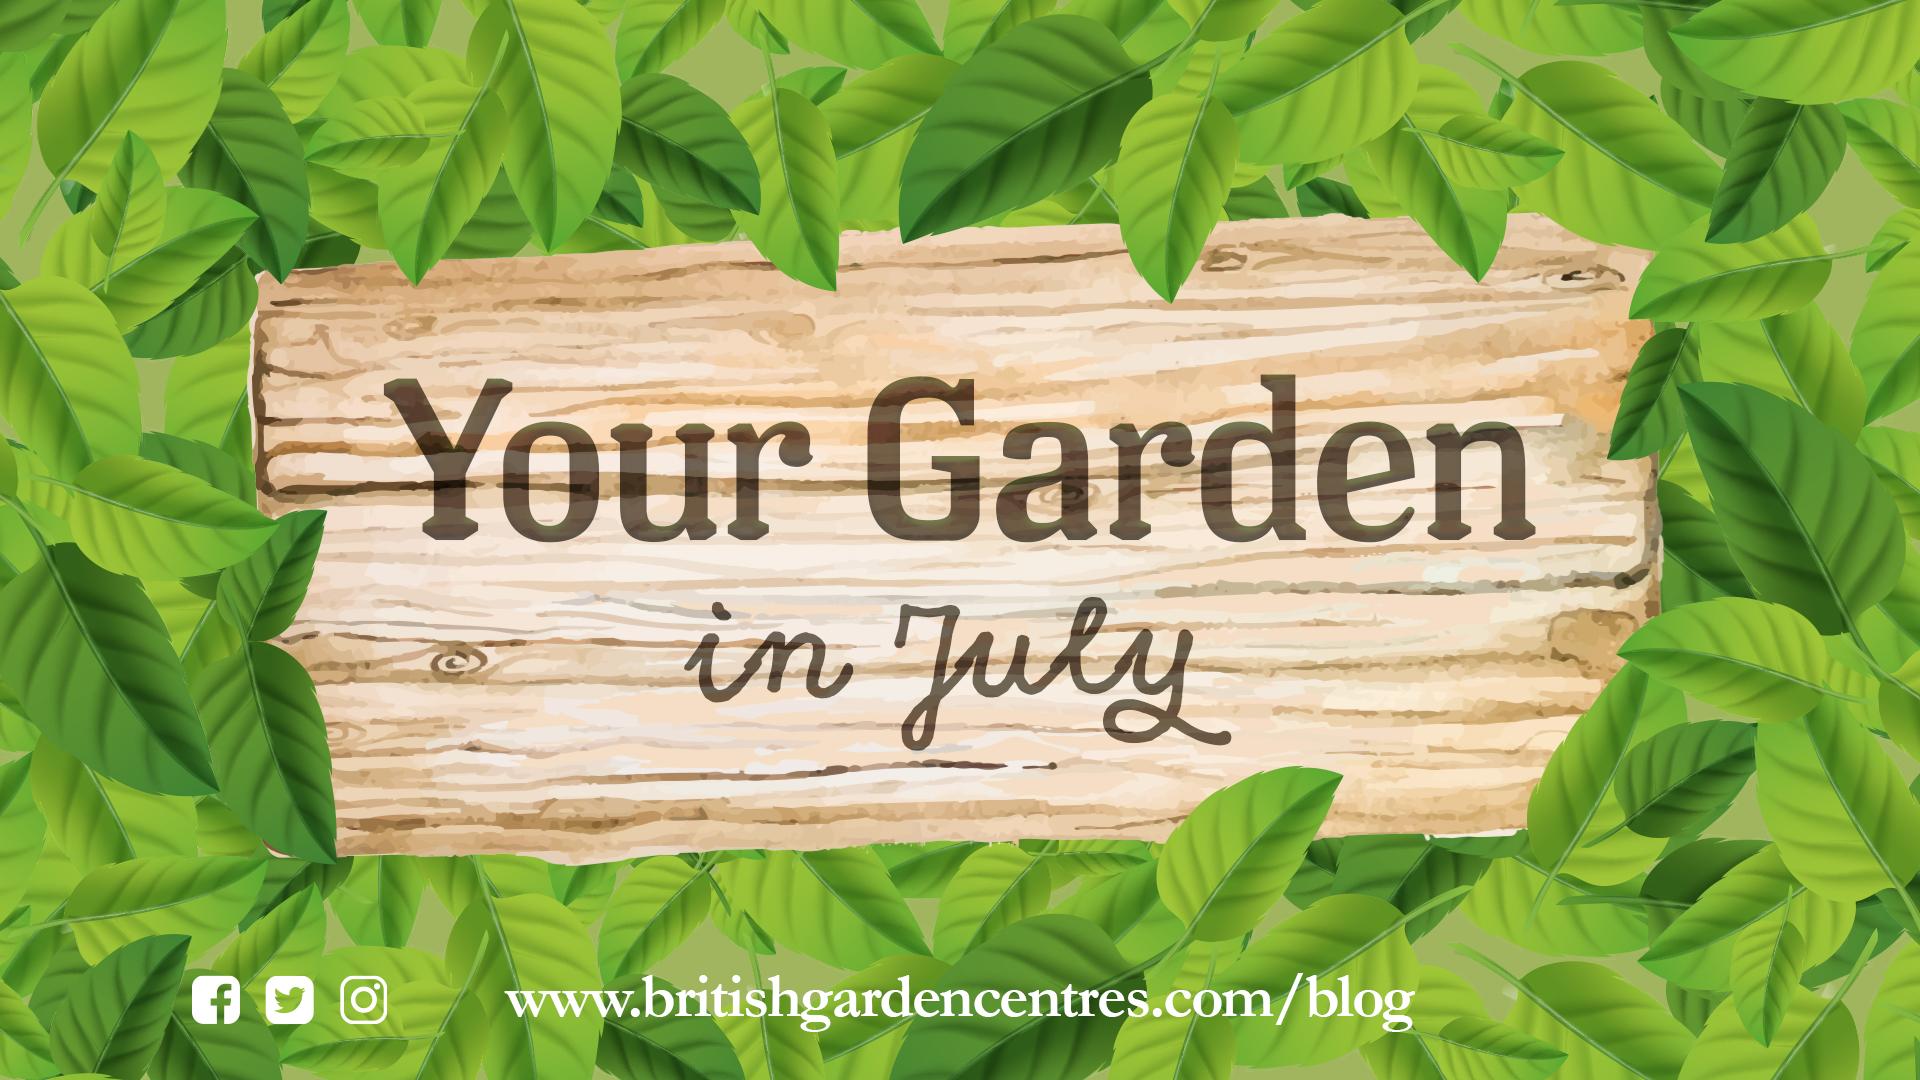 Your garden - July